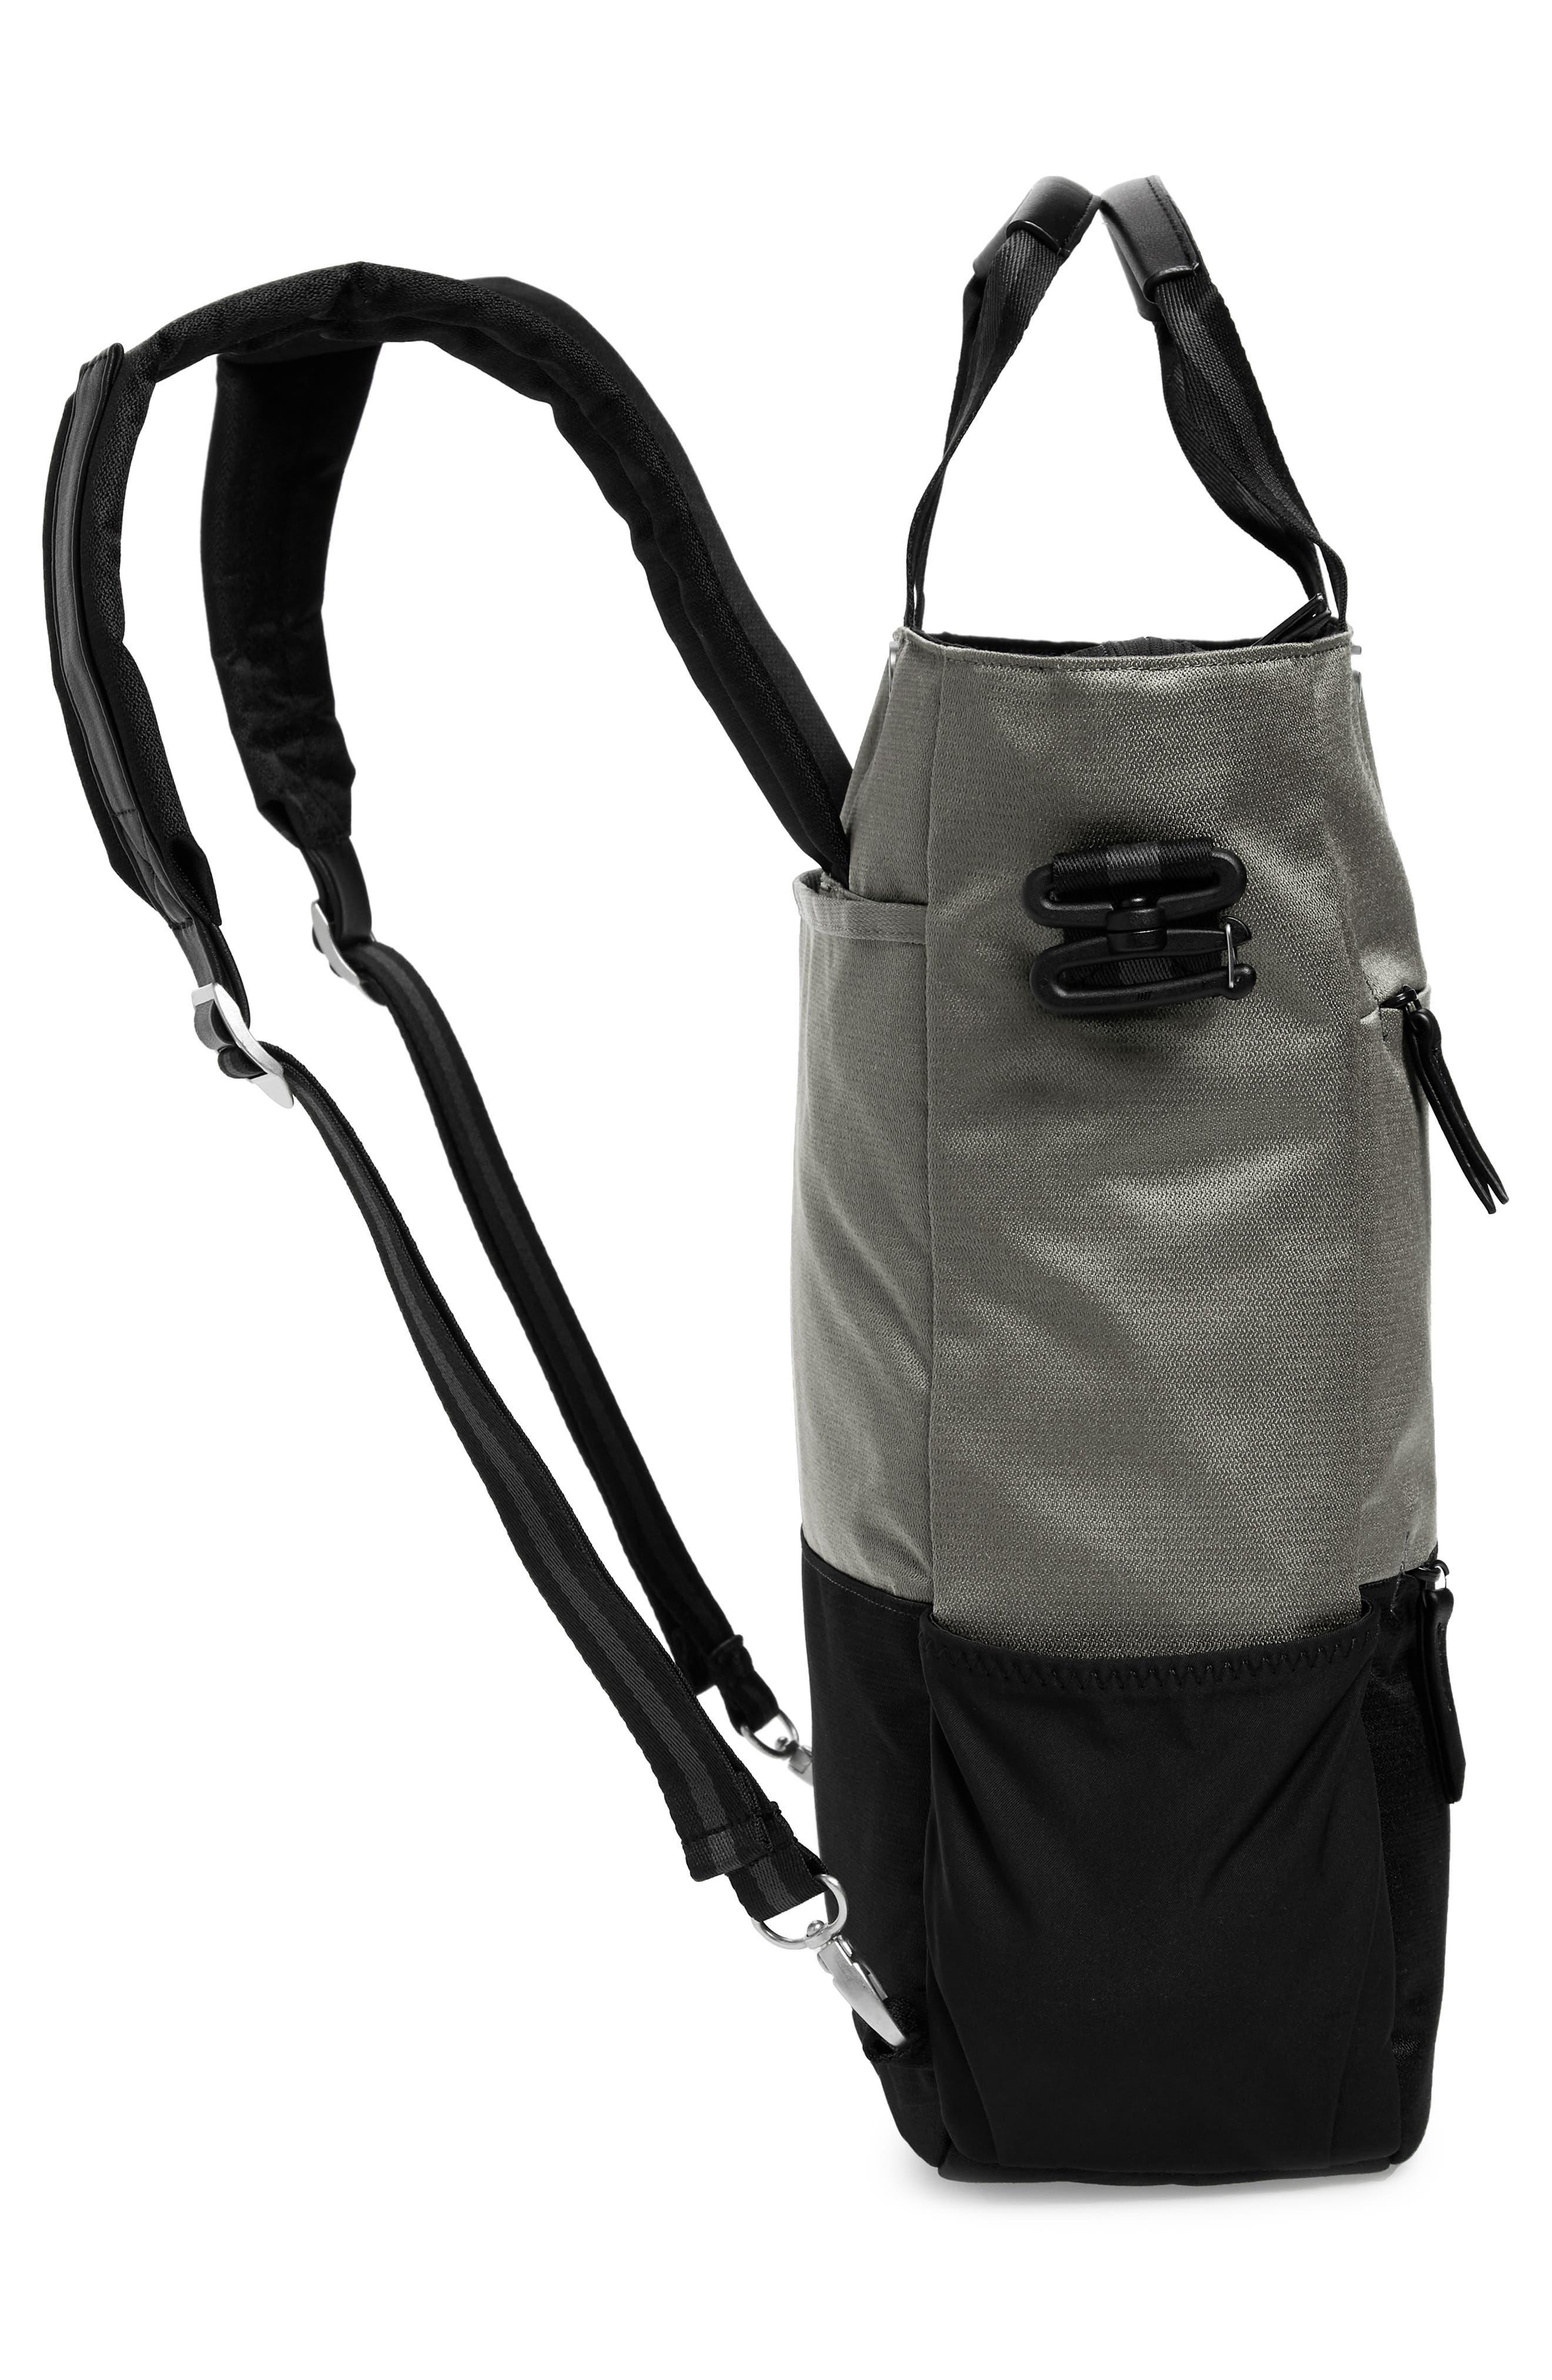 Camden RFID Convertible Backpack,                             Alternate thumbnail 7, color,                             GREY FLINT/ BLACK